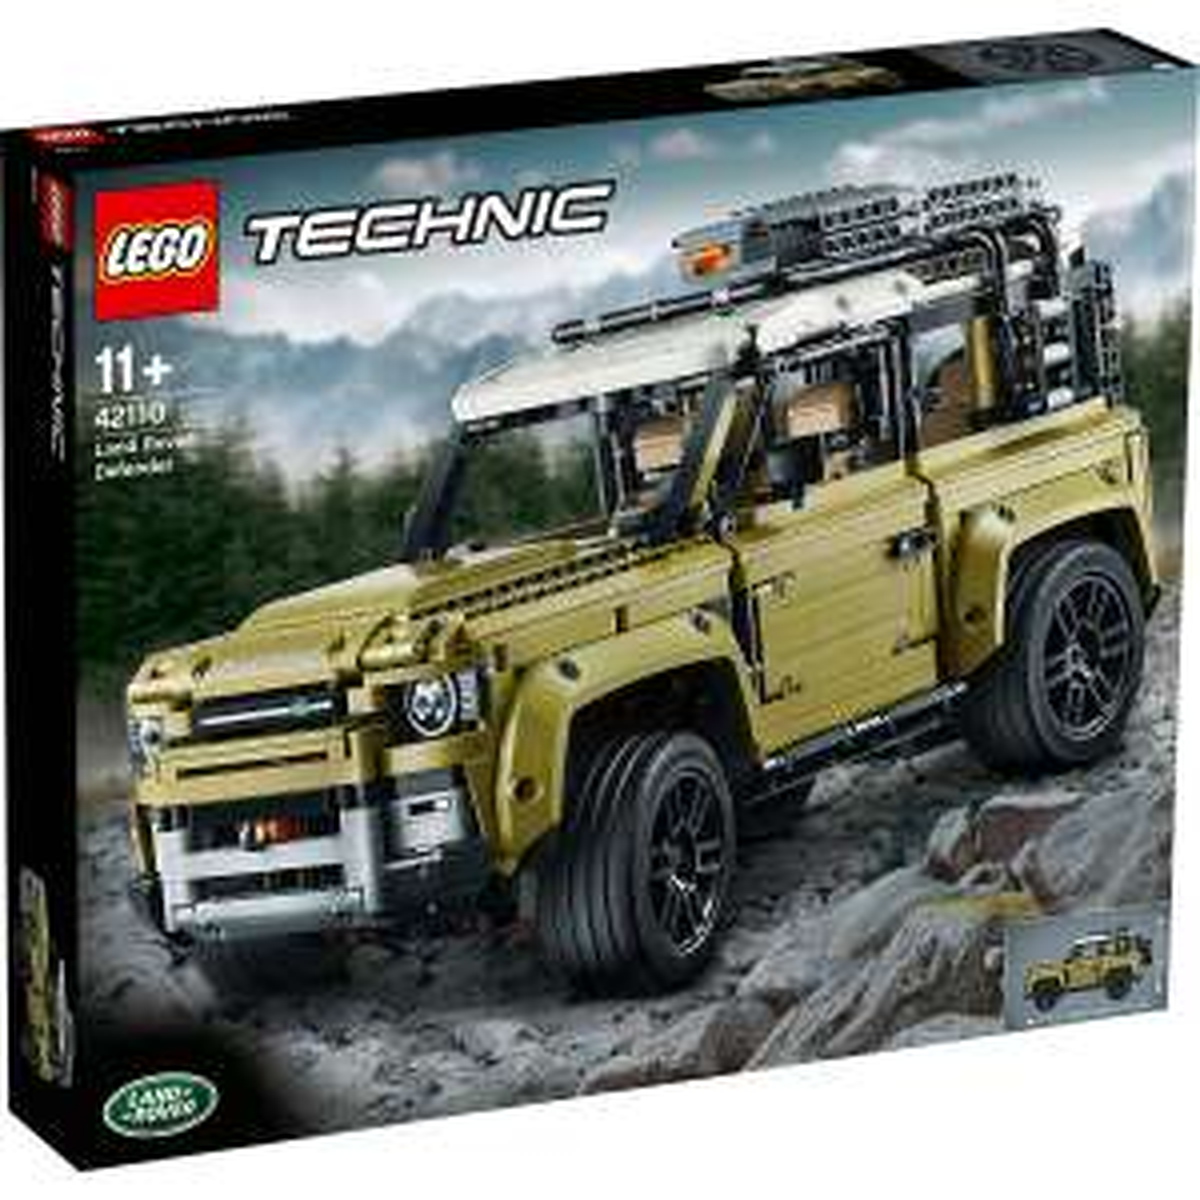 Technic - 42110 Land Rover Defender